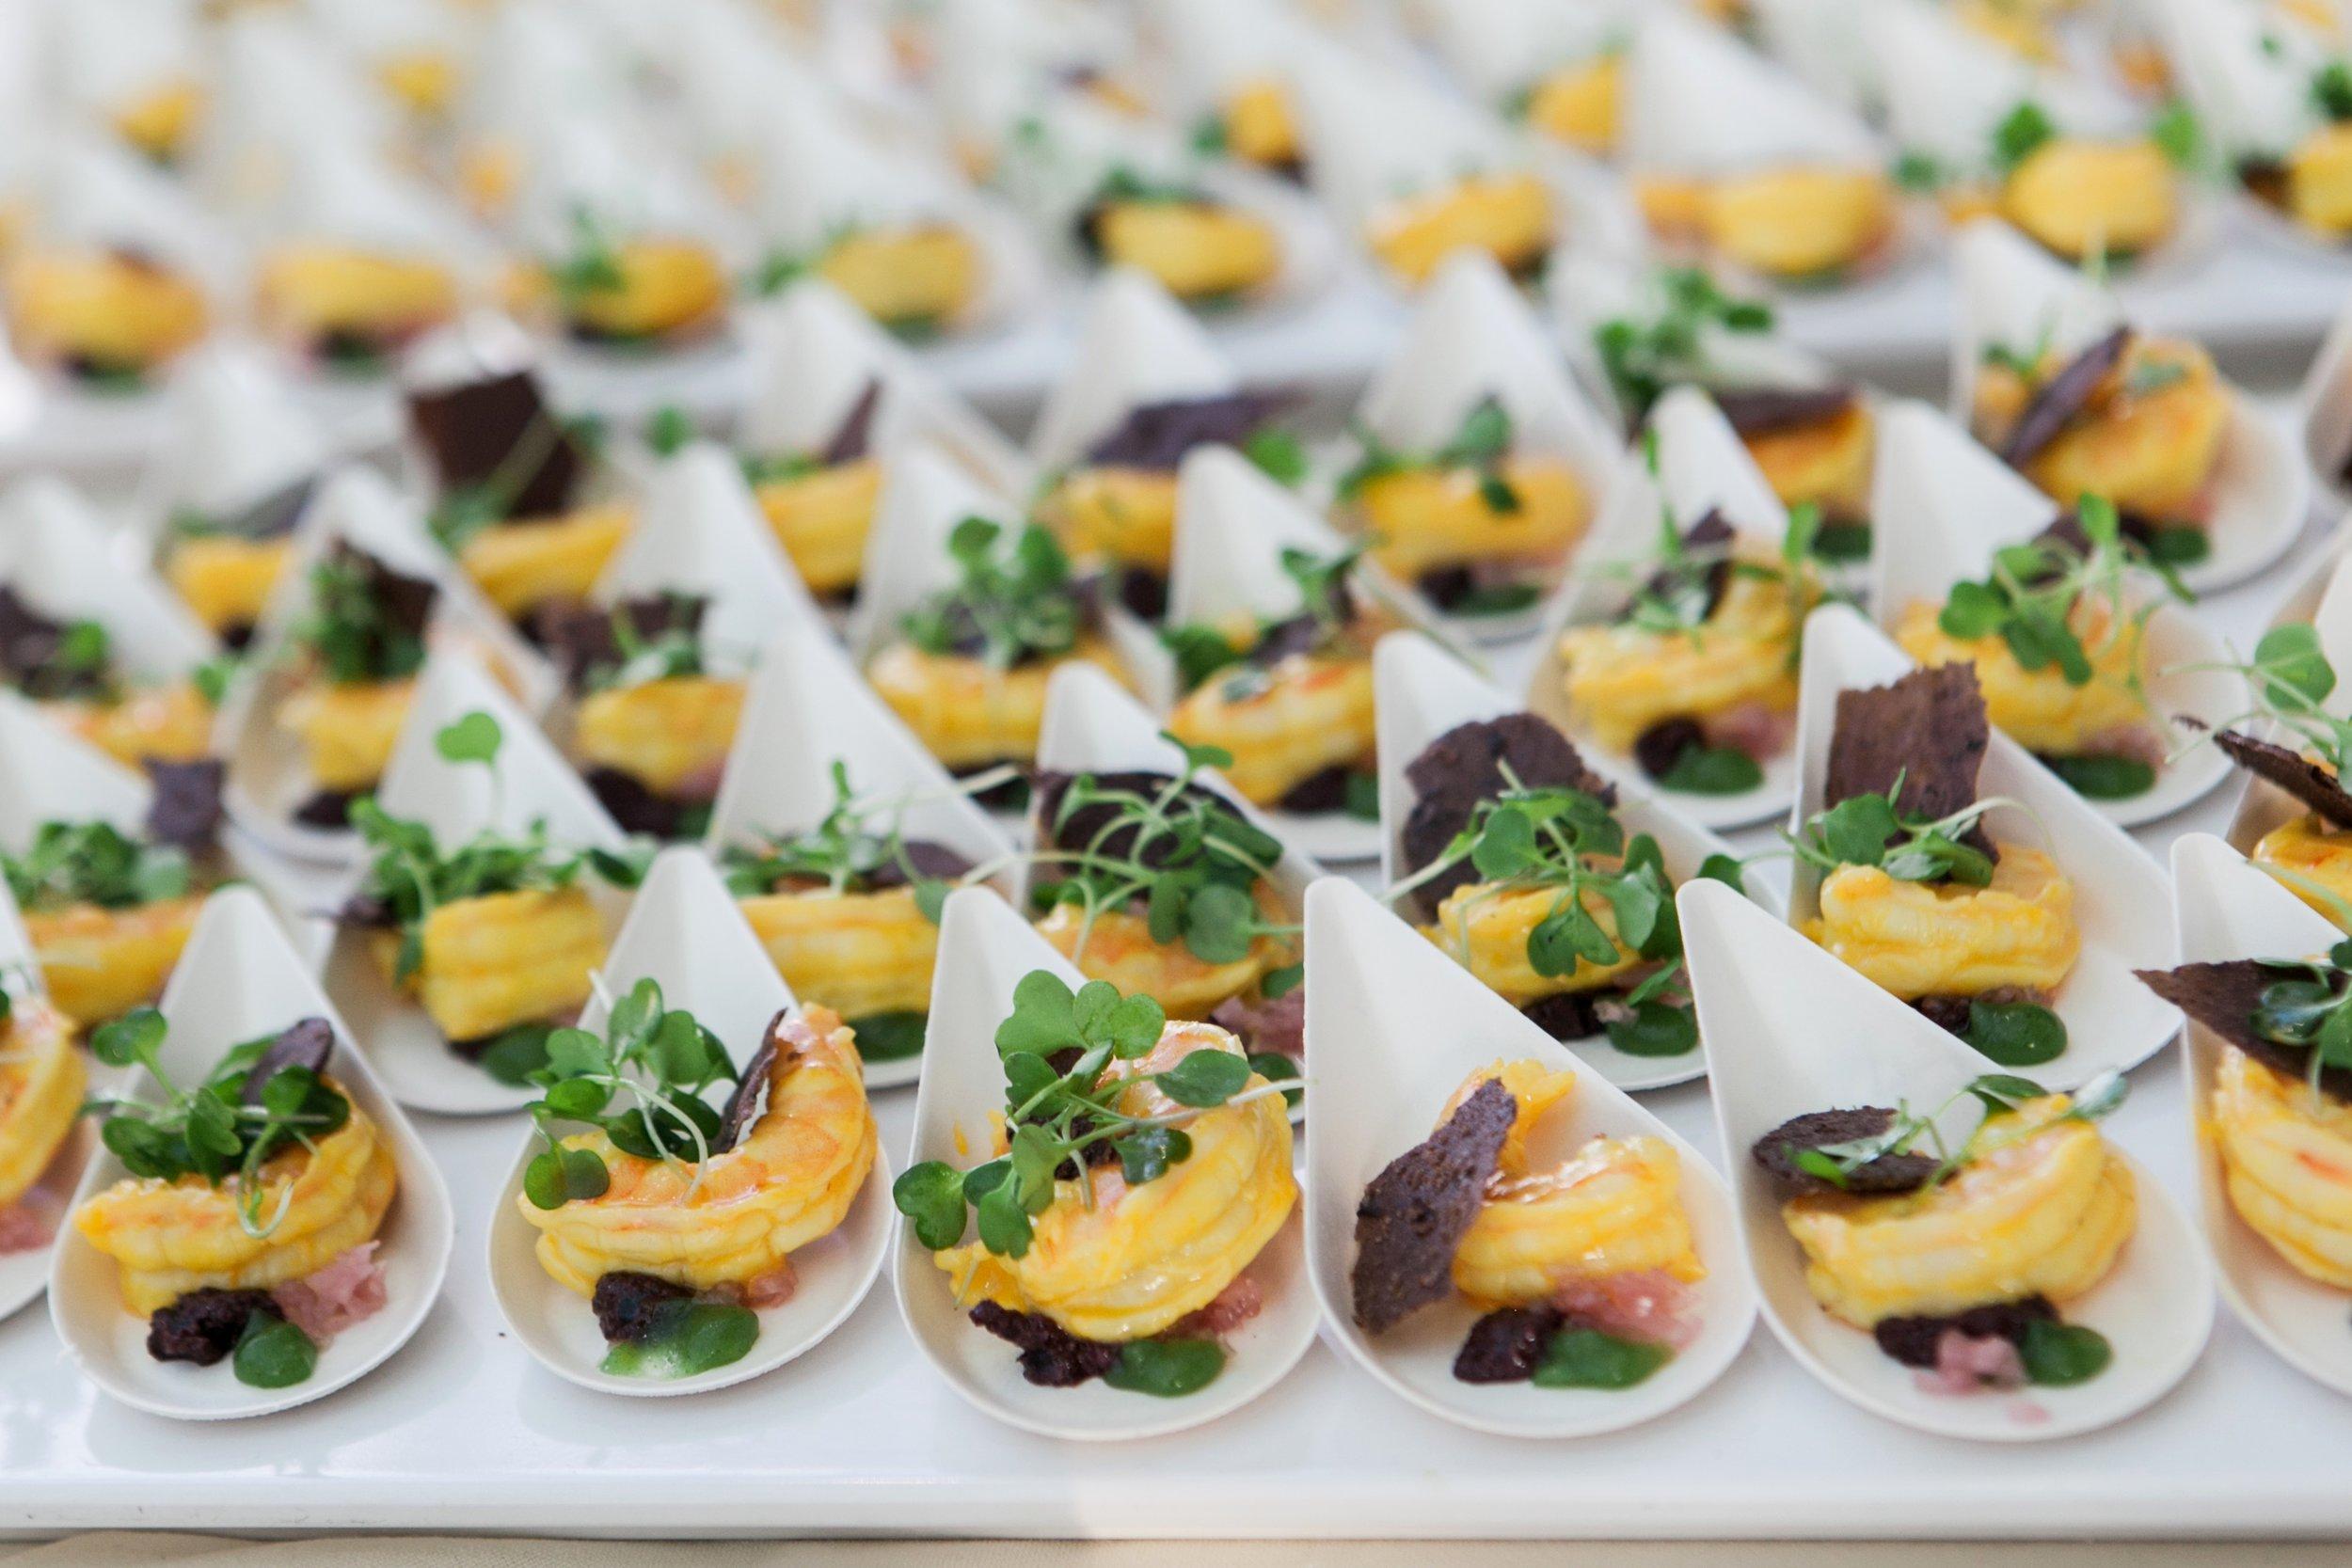 FareStart Catering